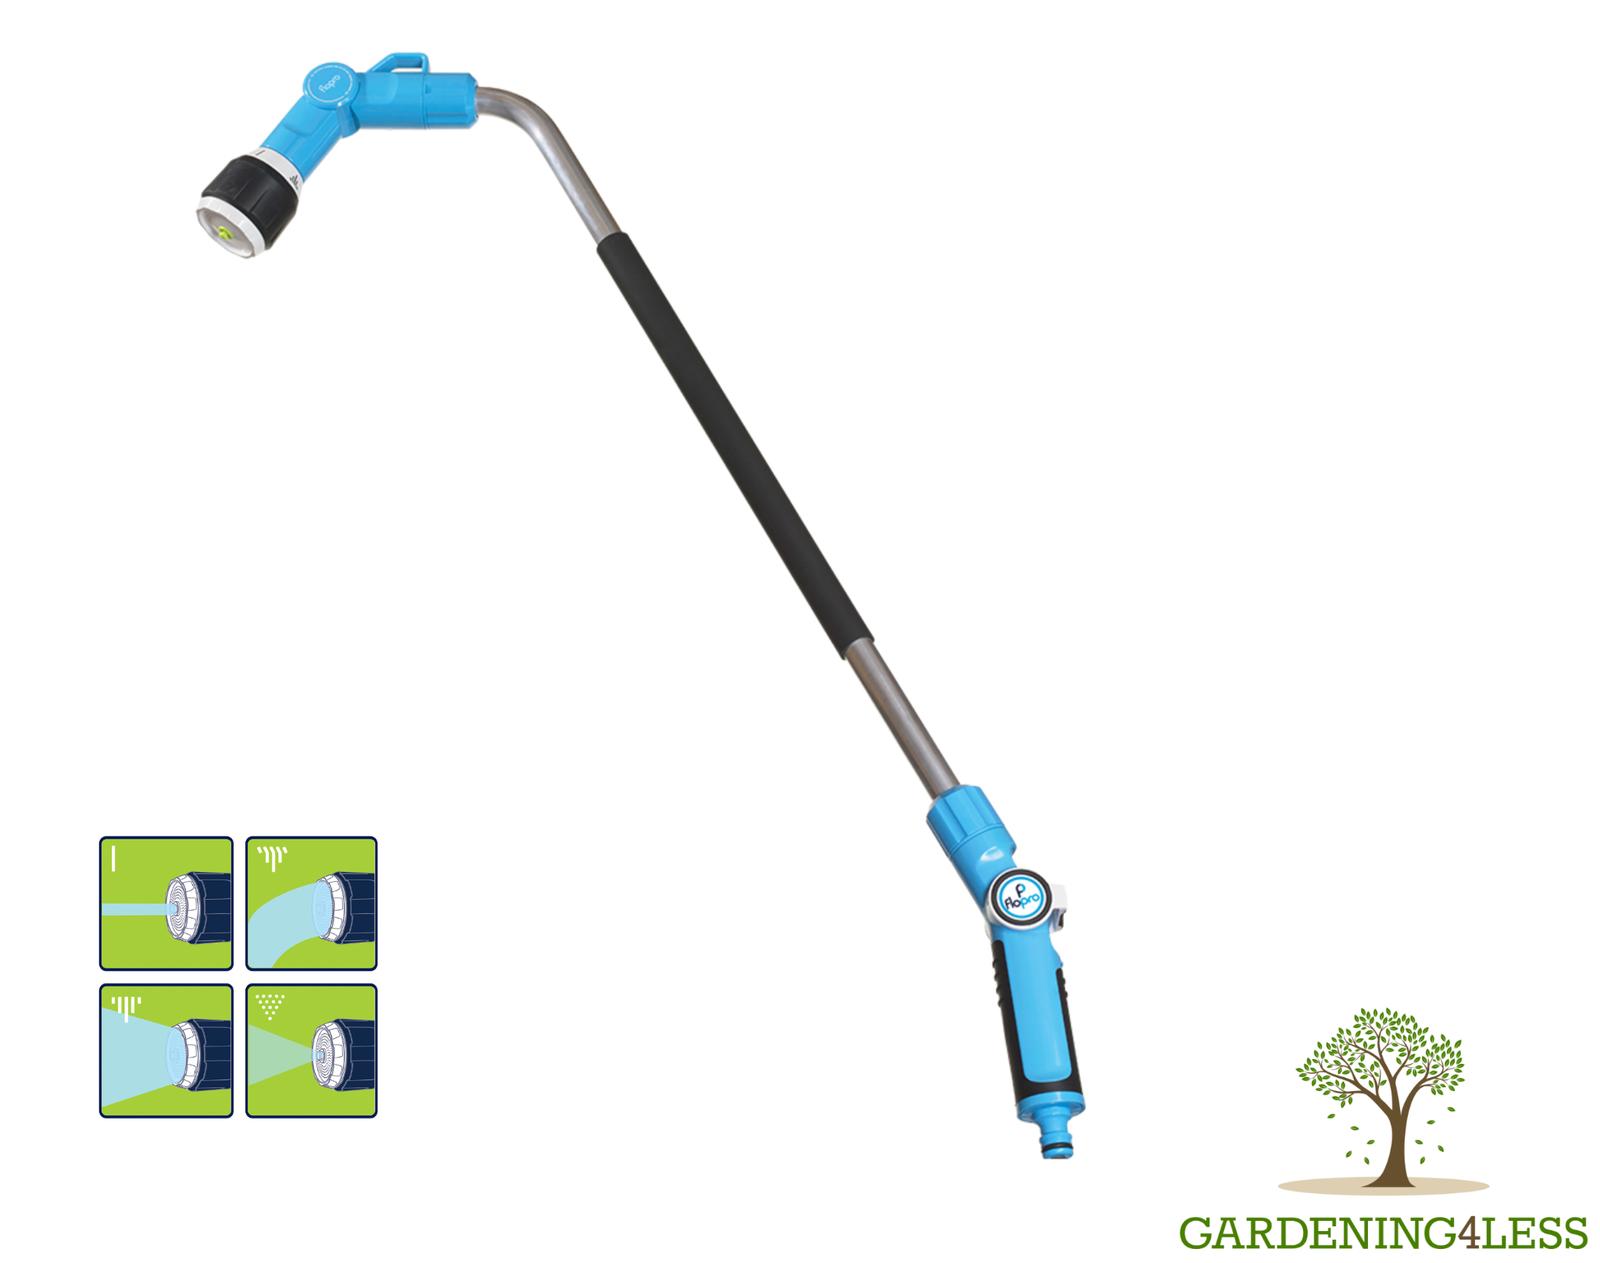 FloPro Activ Watering Lance Anti-leak Universal Garden Hose Watering Attachment